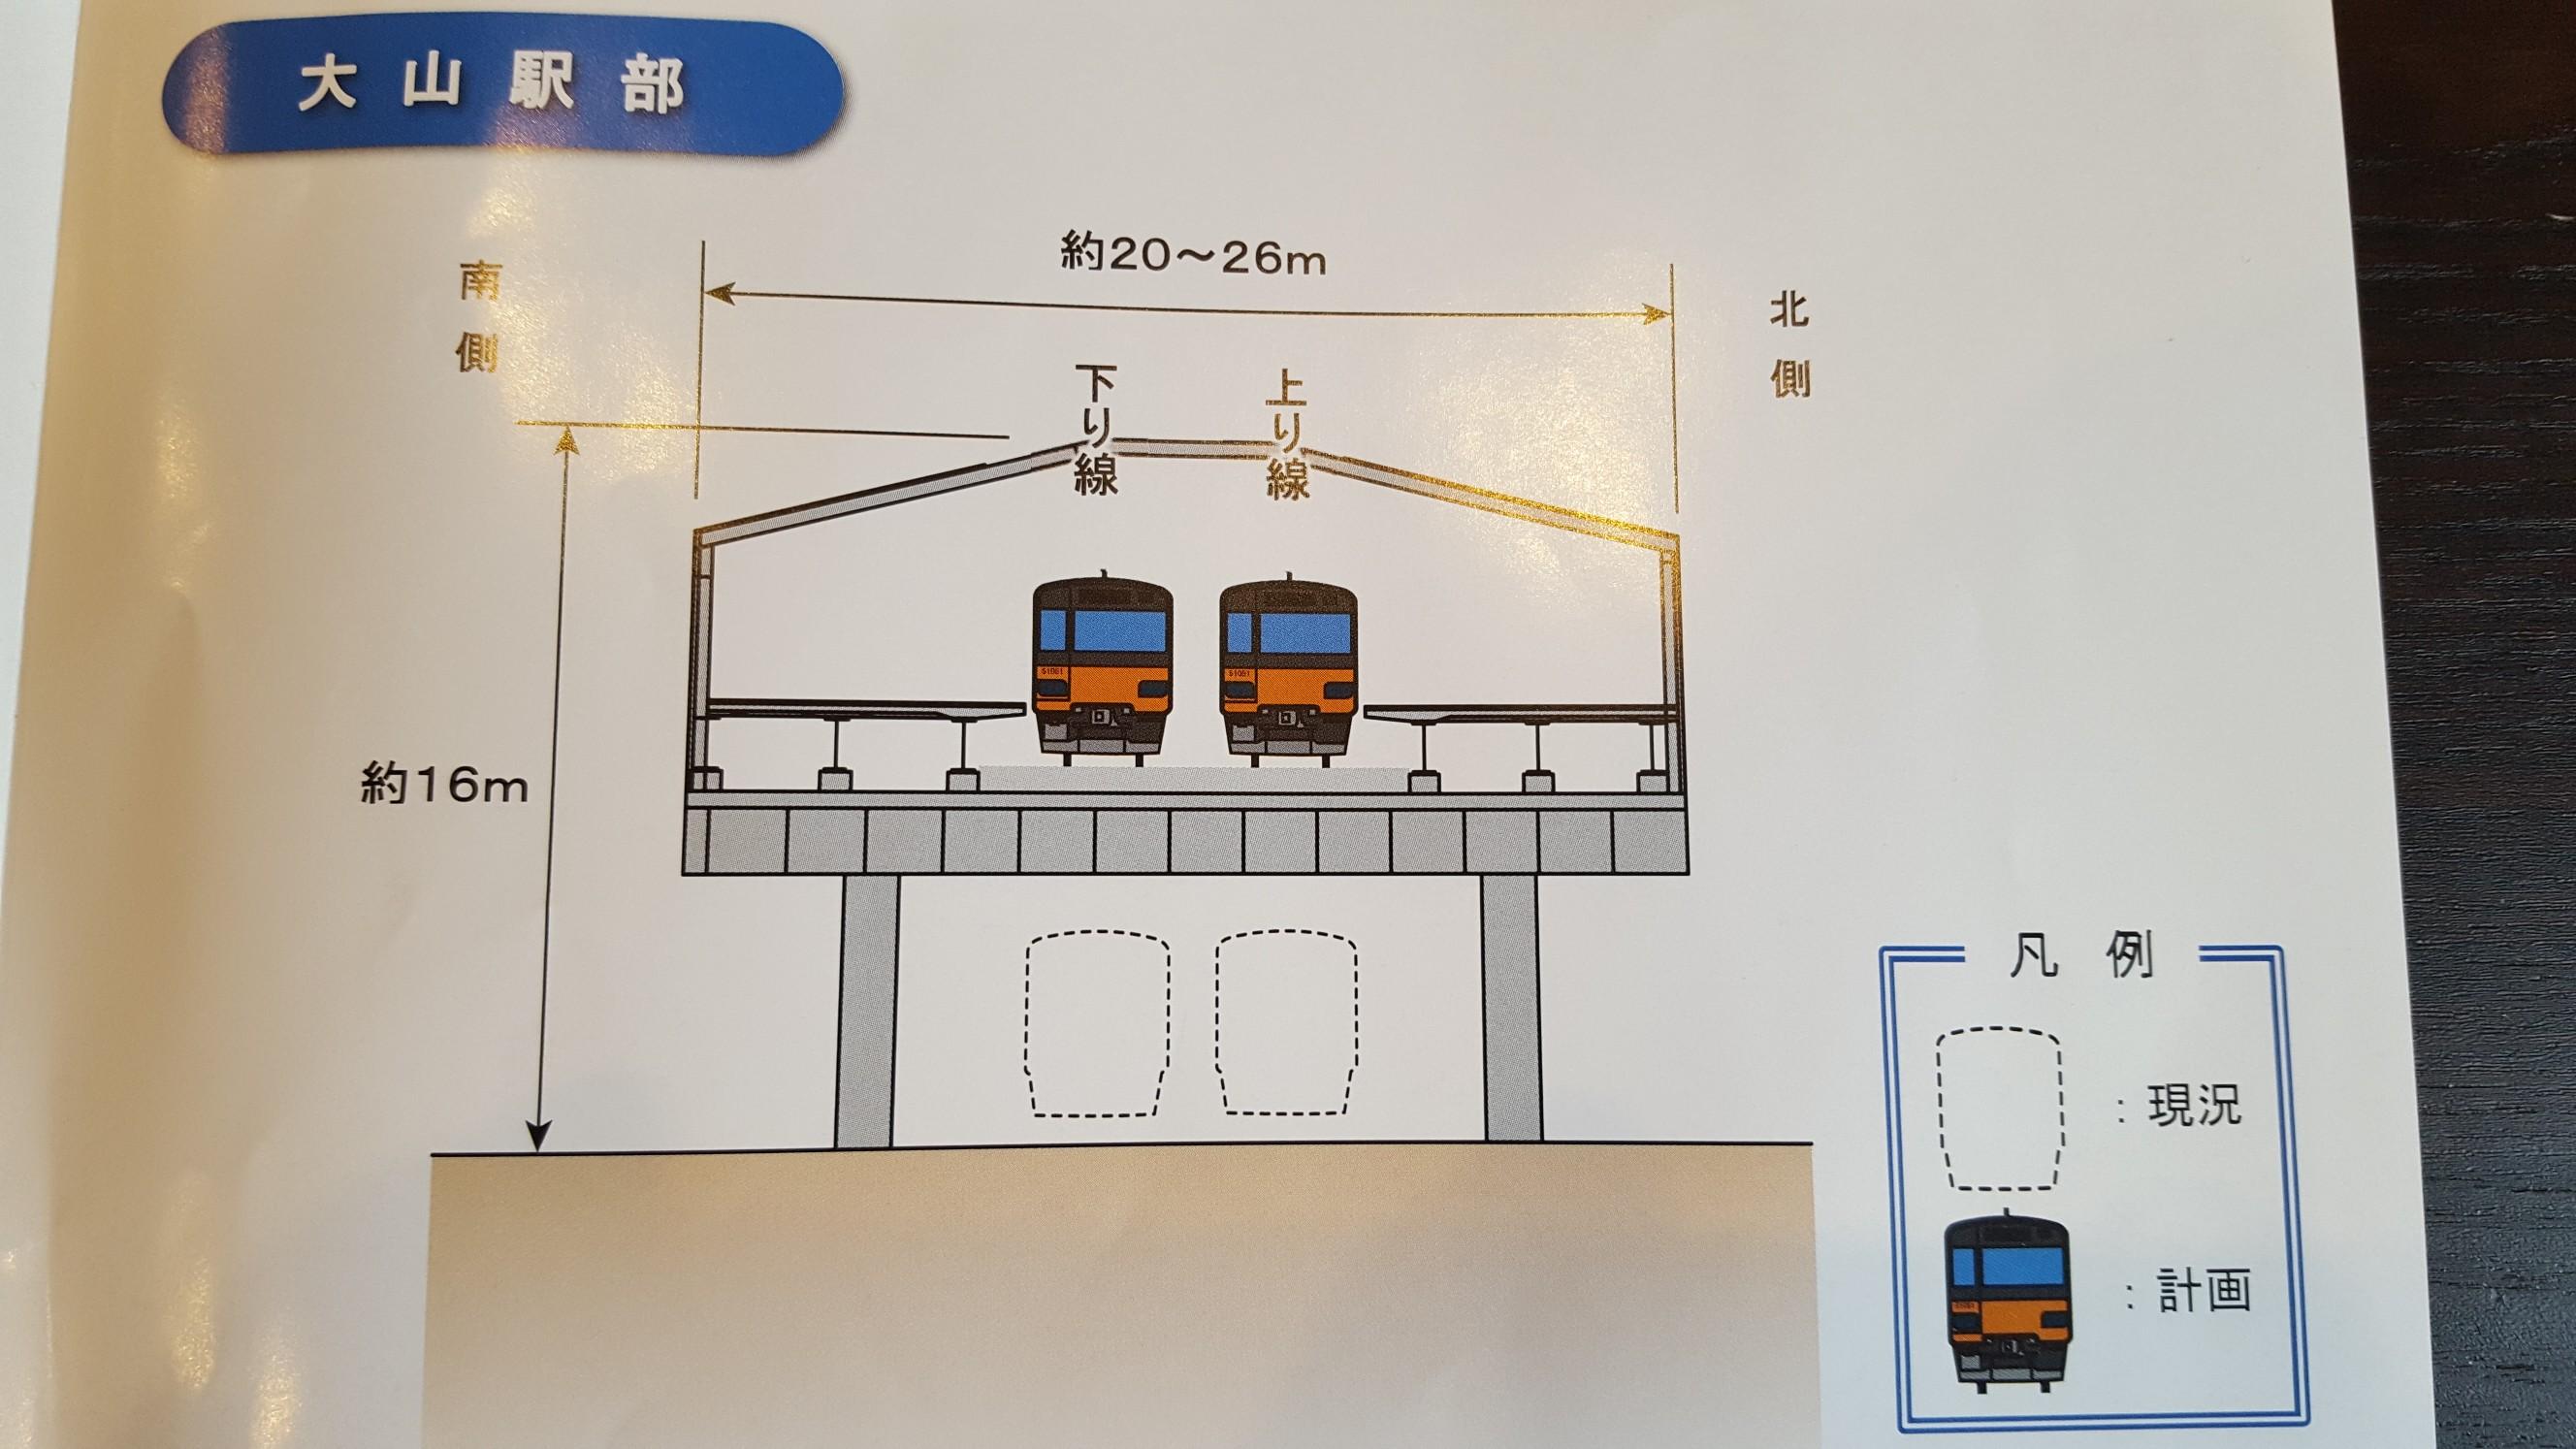 大山駅部分の立体図